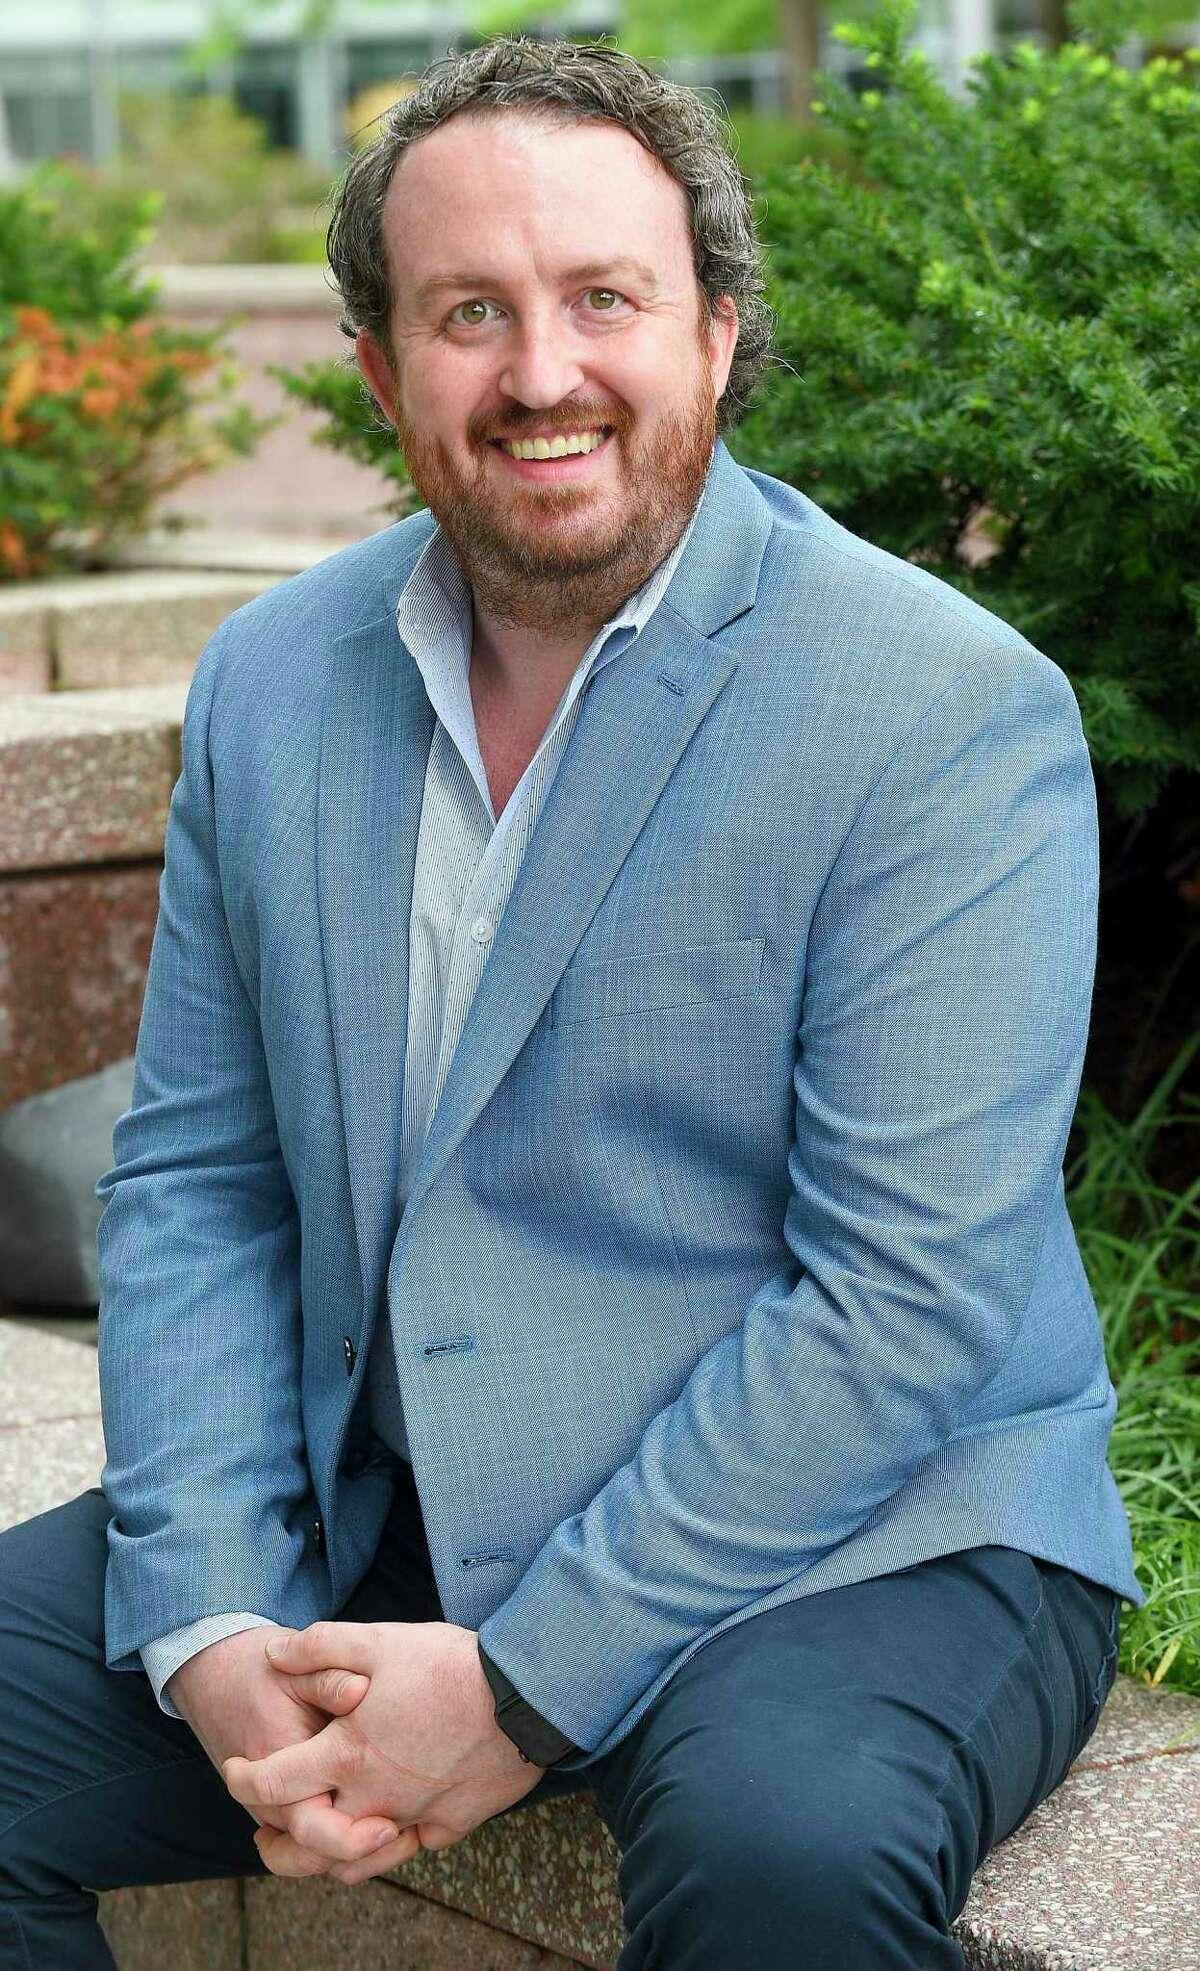 Jon Winkel is executive director of the Stamford Partnership.